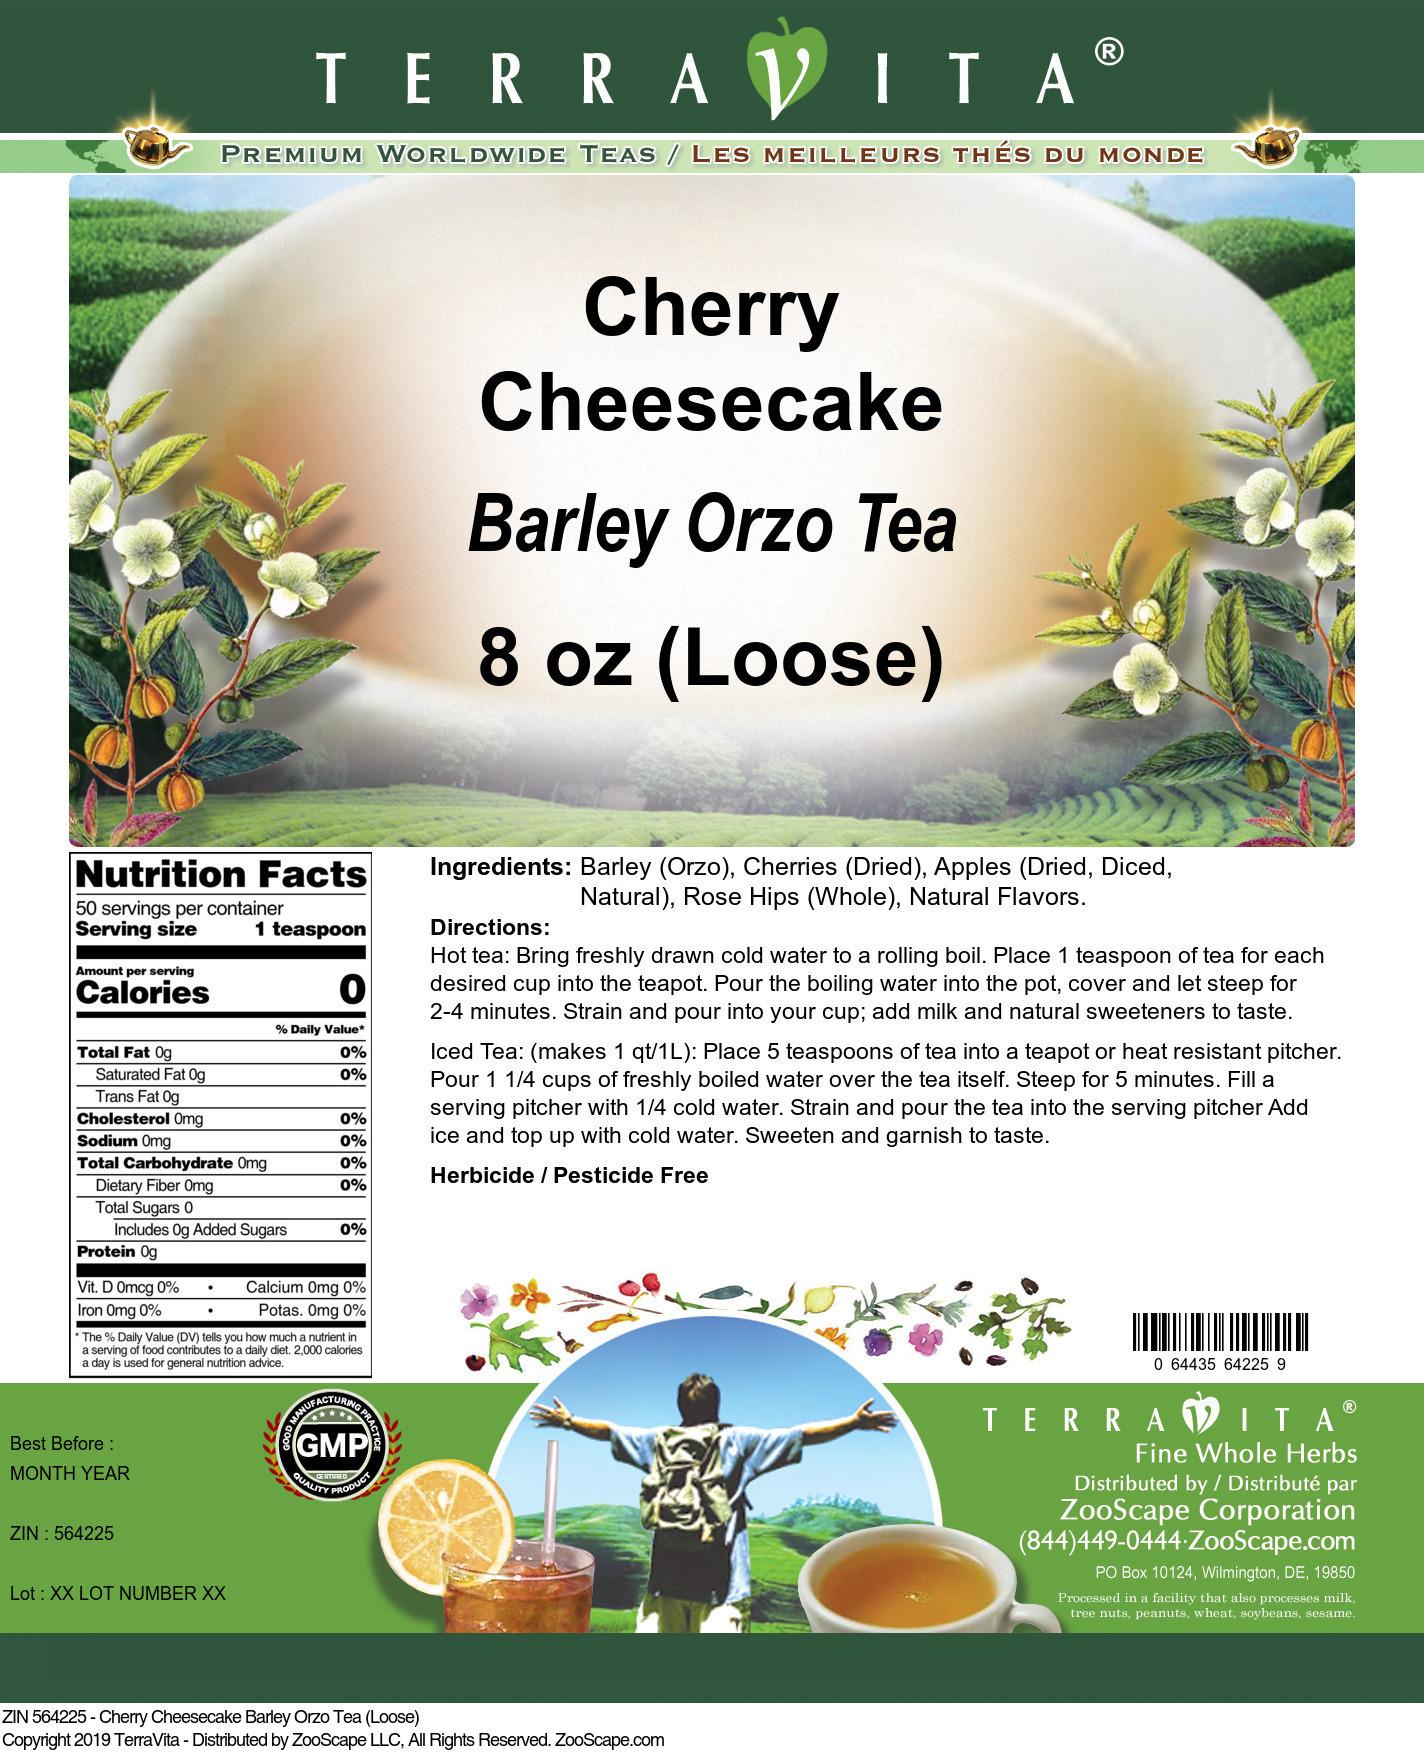 Cherry Cheesecake Barley Orzo Tea (Loose)